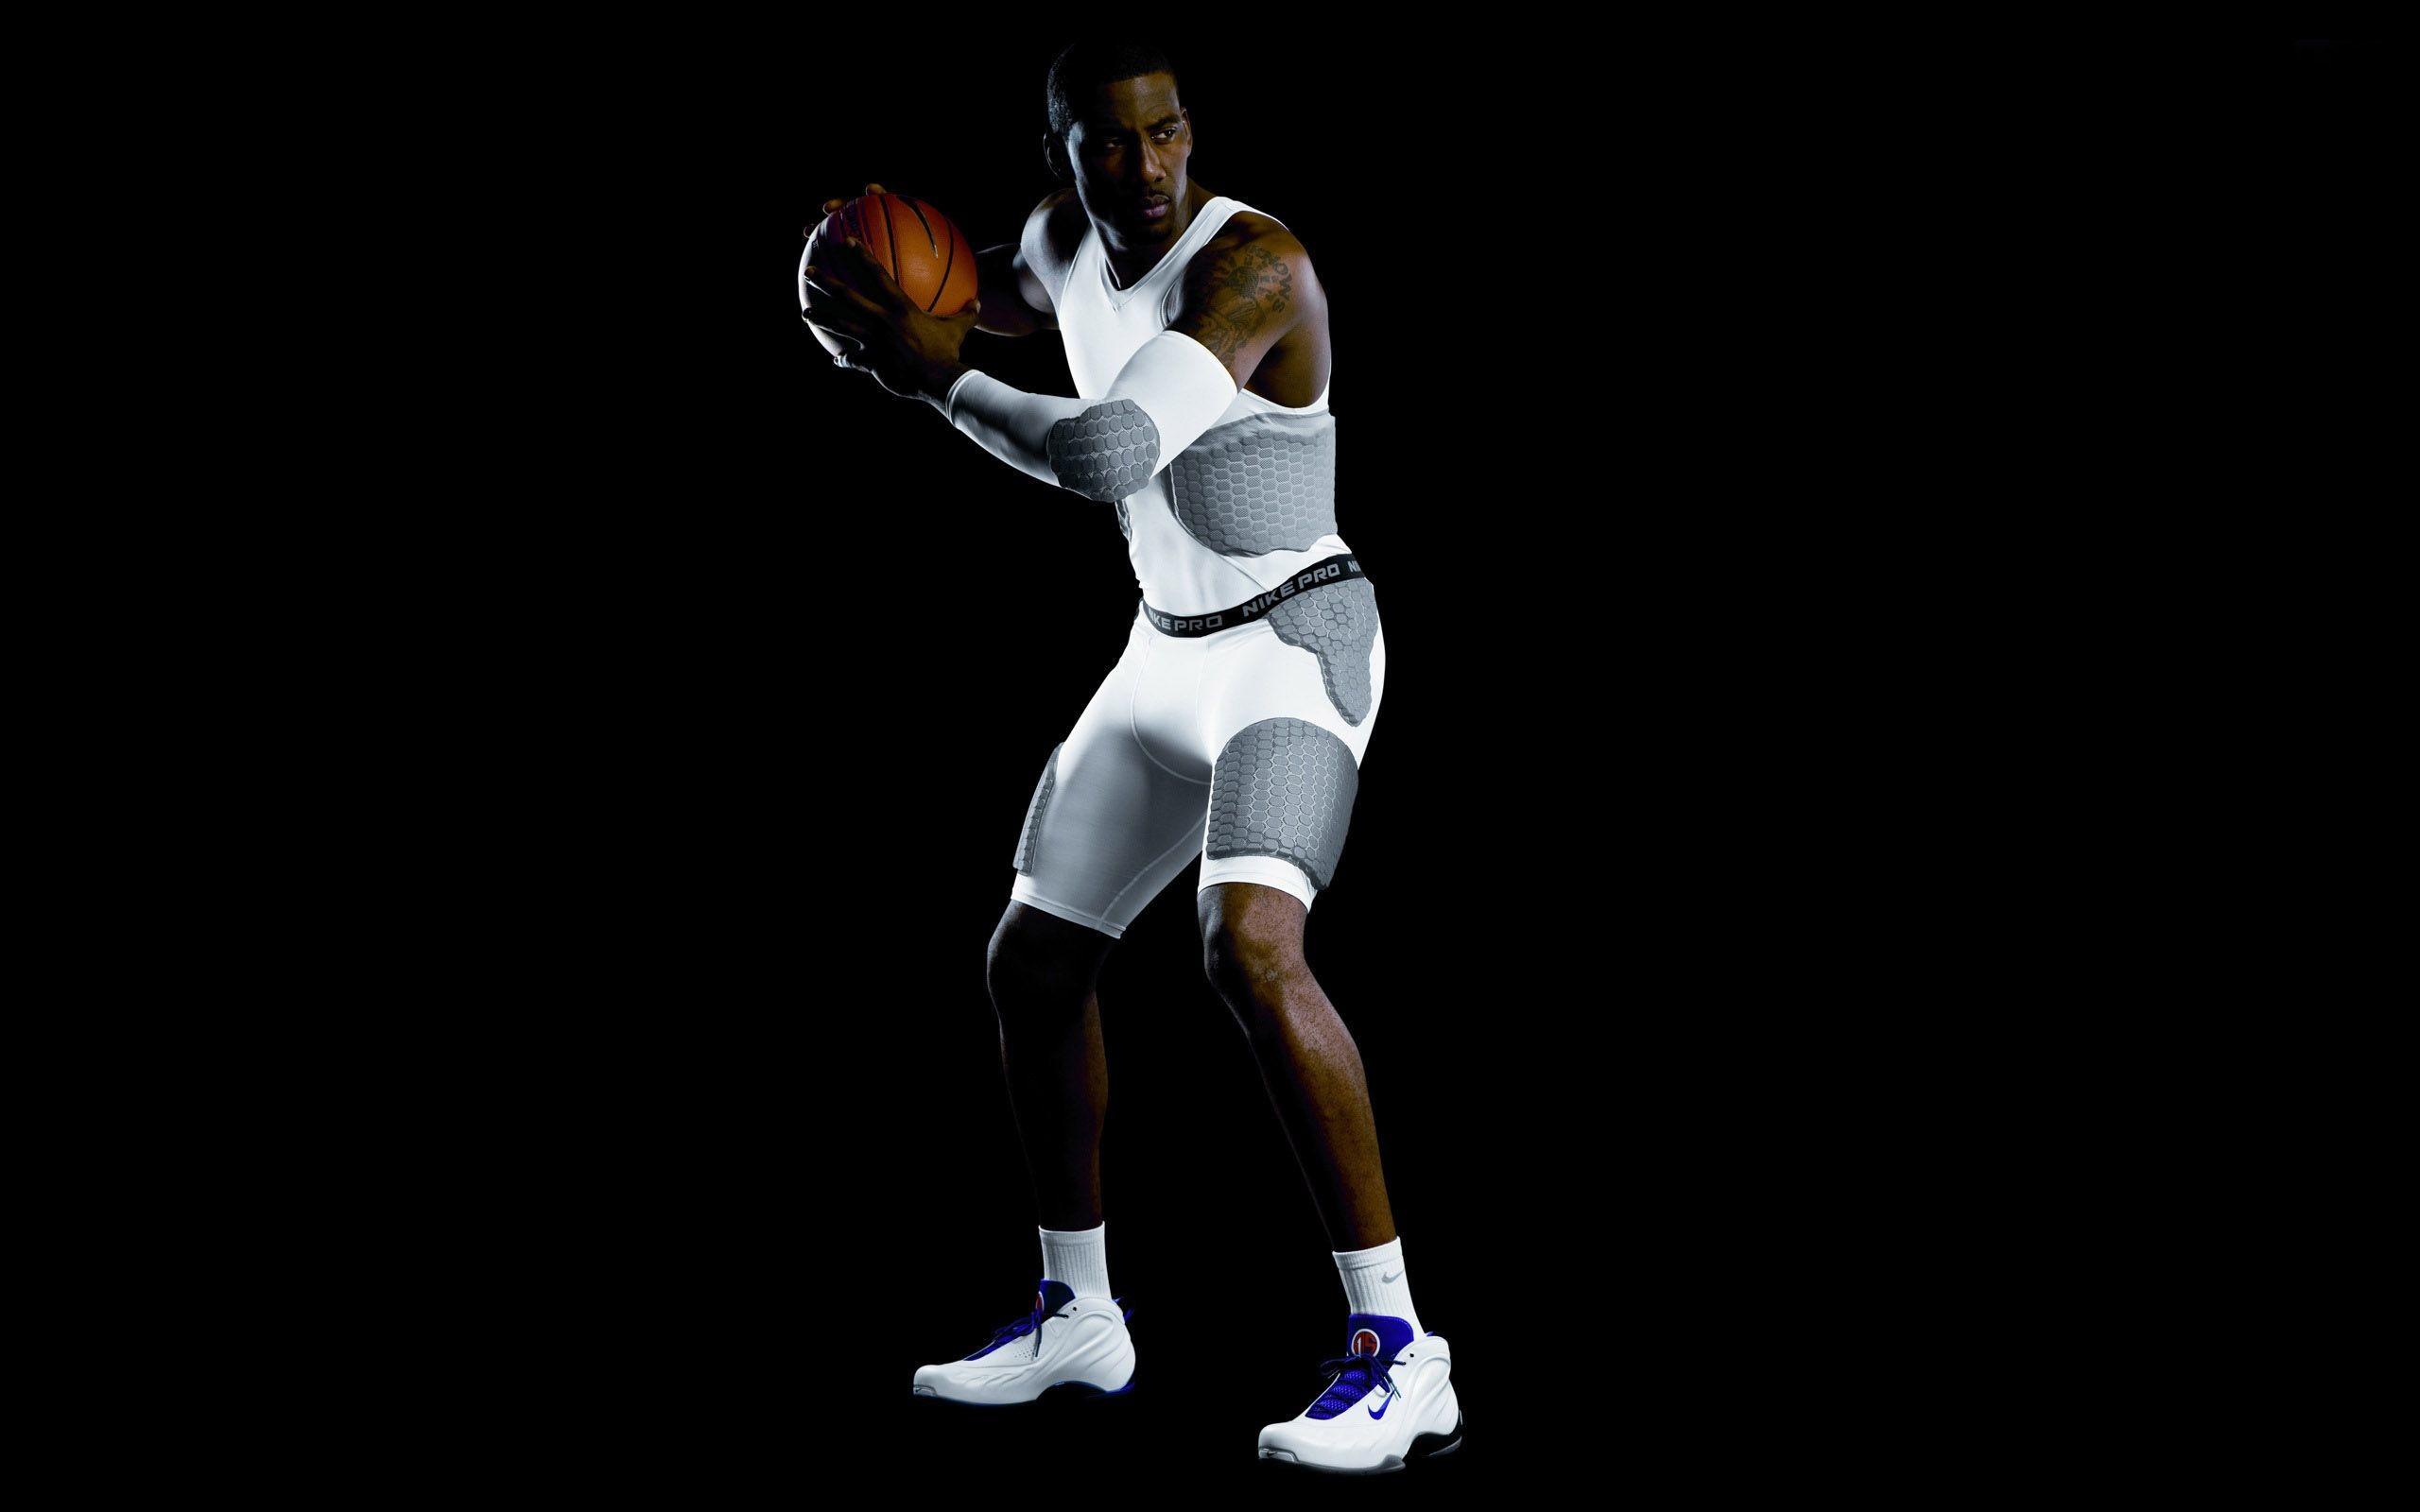 1920x1200 LeBron James NBA HD Wallpapers